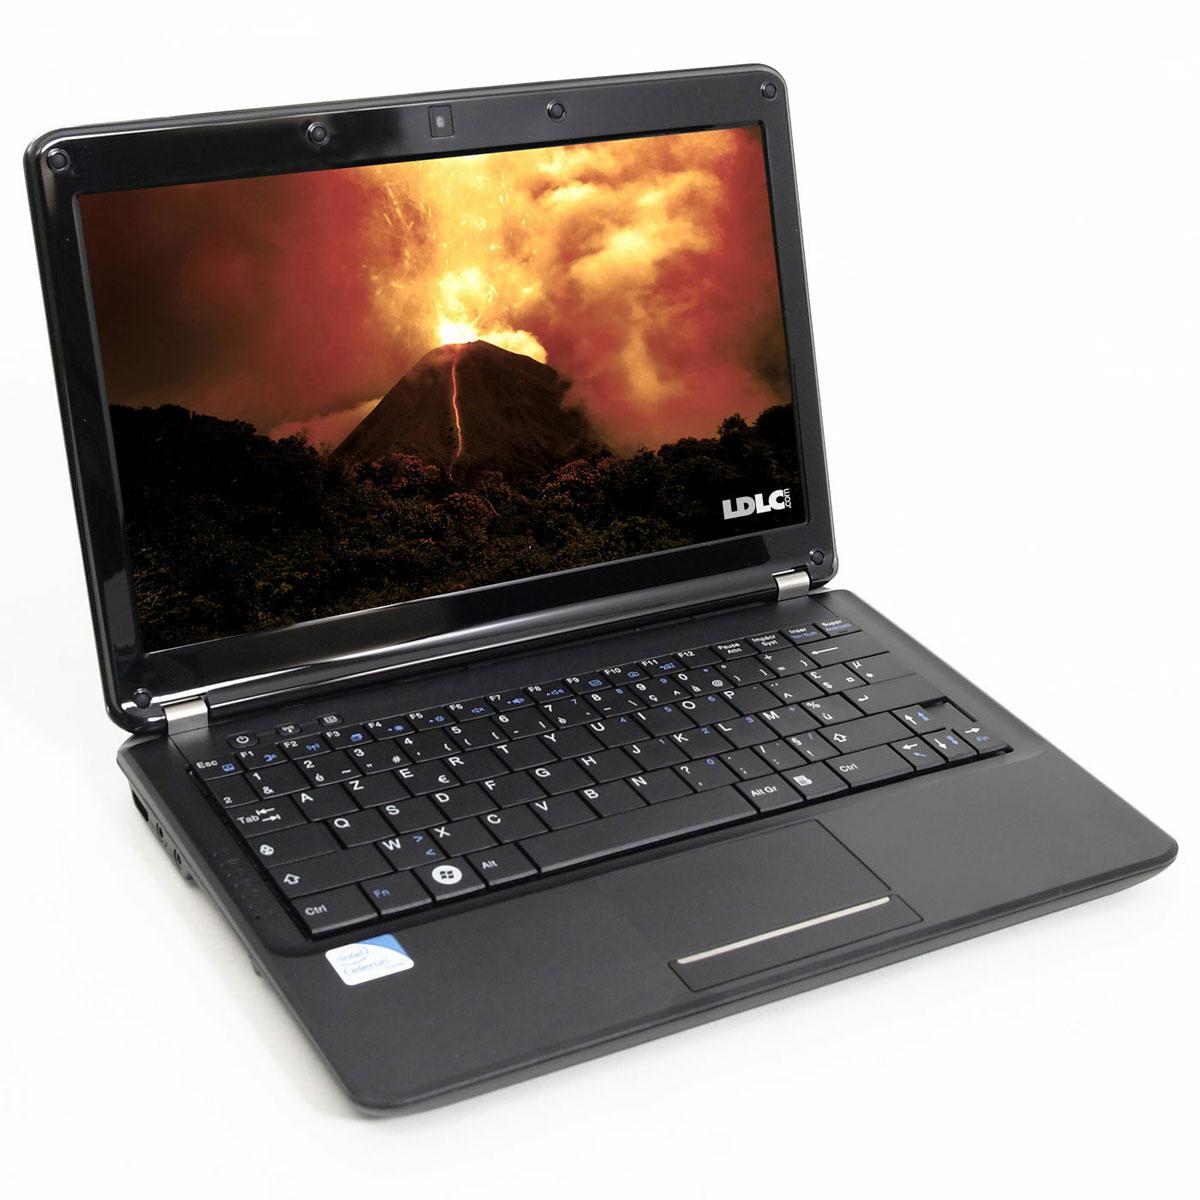 "PC portable LDLC Vulcain SM2-BBN Barebone PC Portable Intel Core 2 Duo SU7300 11.6"" LCD Wi-Fi N/Bluetooth Webcam (sans HDD/Mémoire/OS)"